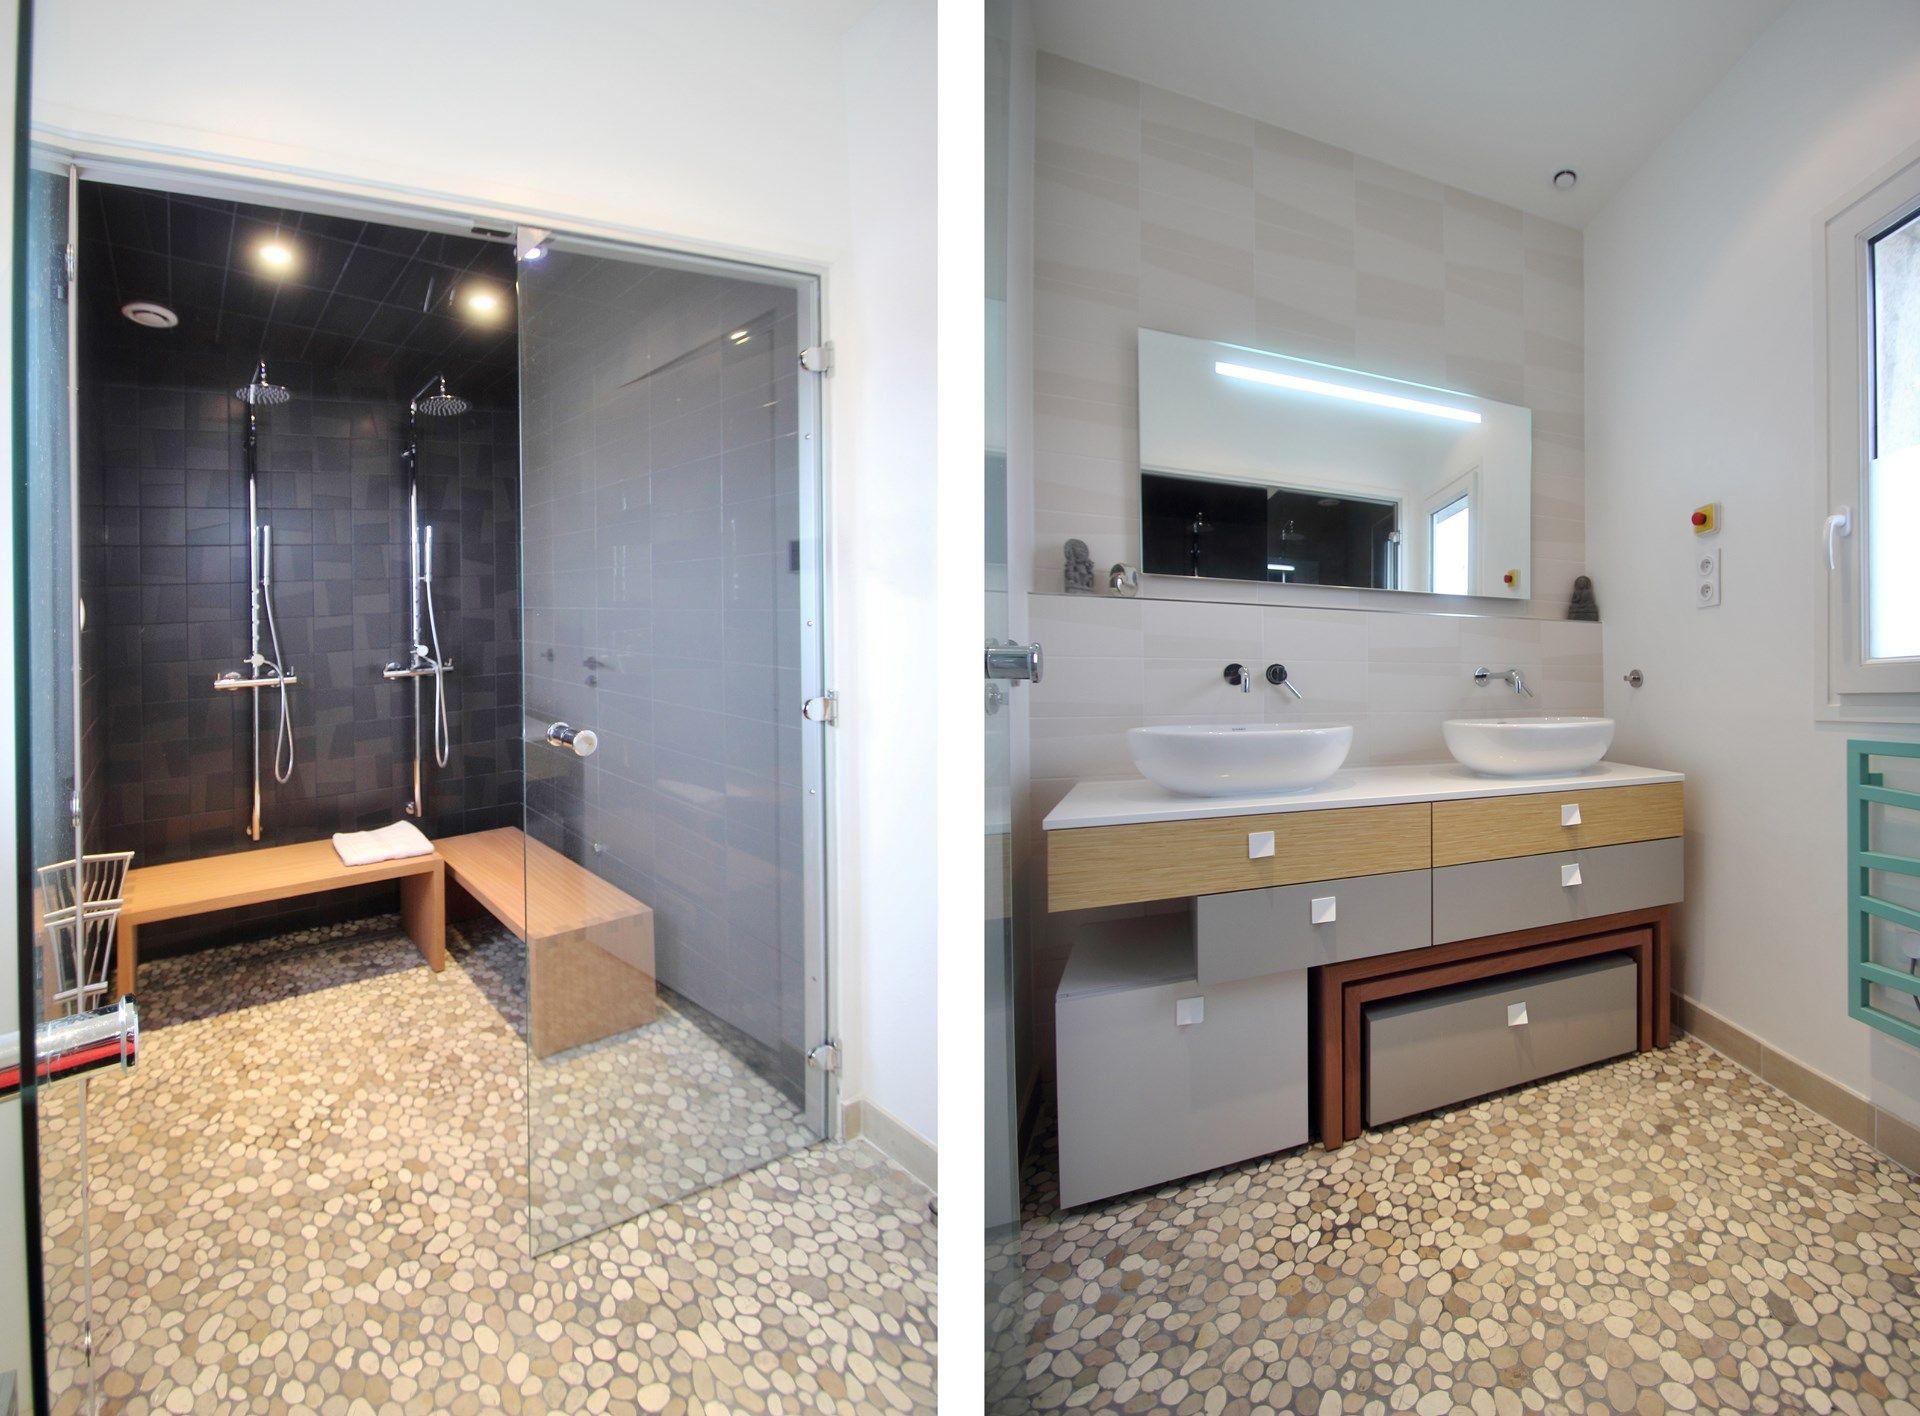 appartement sdb hammam grande douche a l italienne agence avous agence avous salle de bain. Black Bedroom Furniture Sets. Home Design Ideas